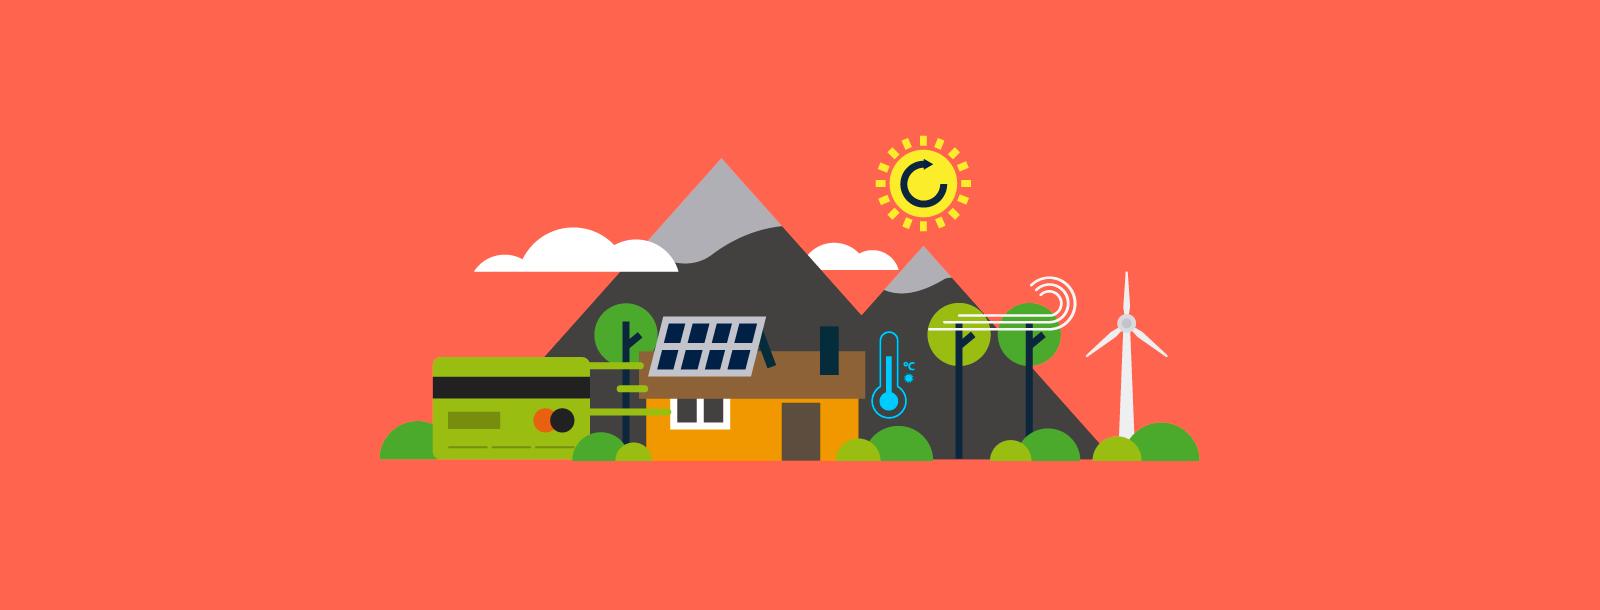 PuroPellet: Lanzan crédito verde para implementar hogares ecológicos